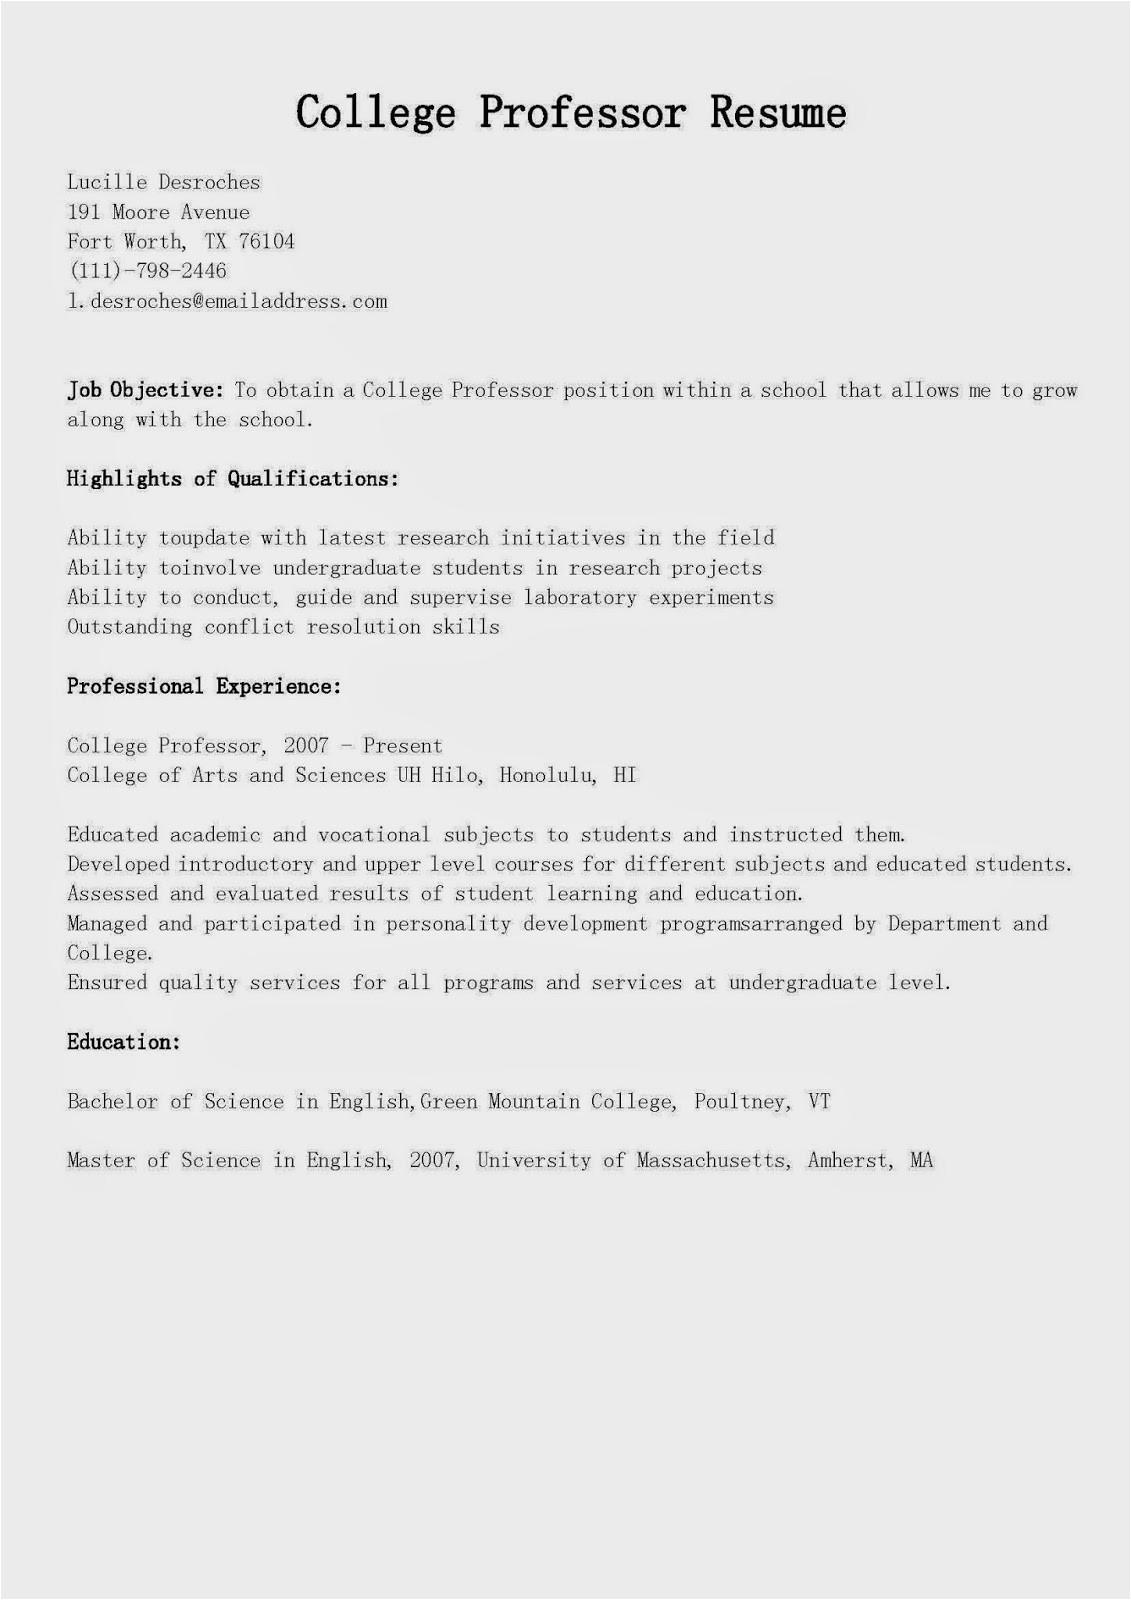 Resume Samples for Professors Resume Samples College Professor Resume Sample